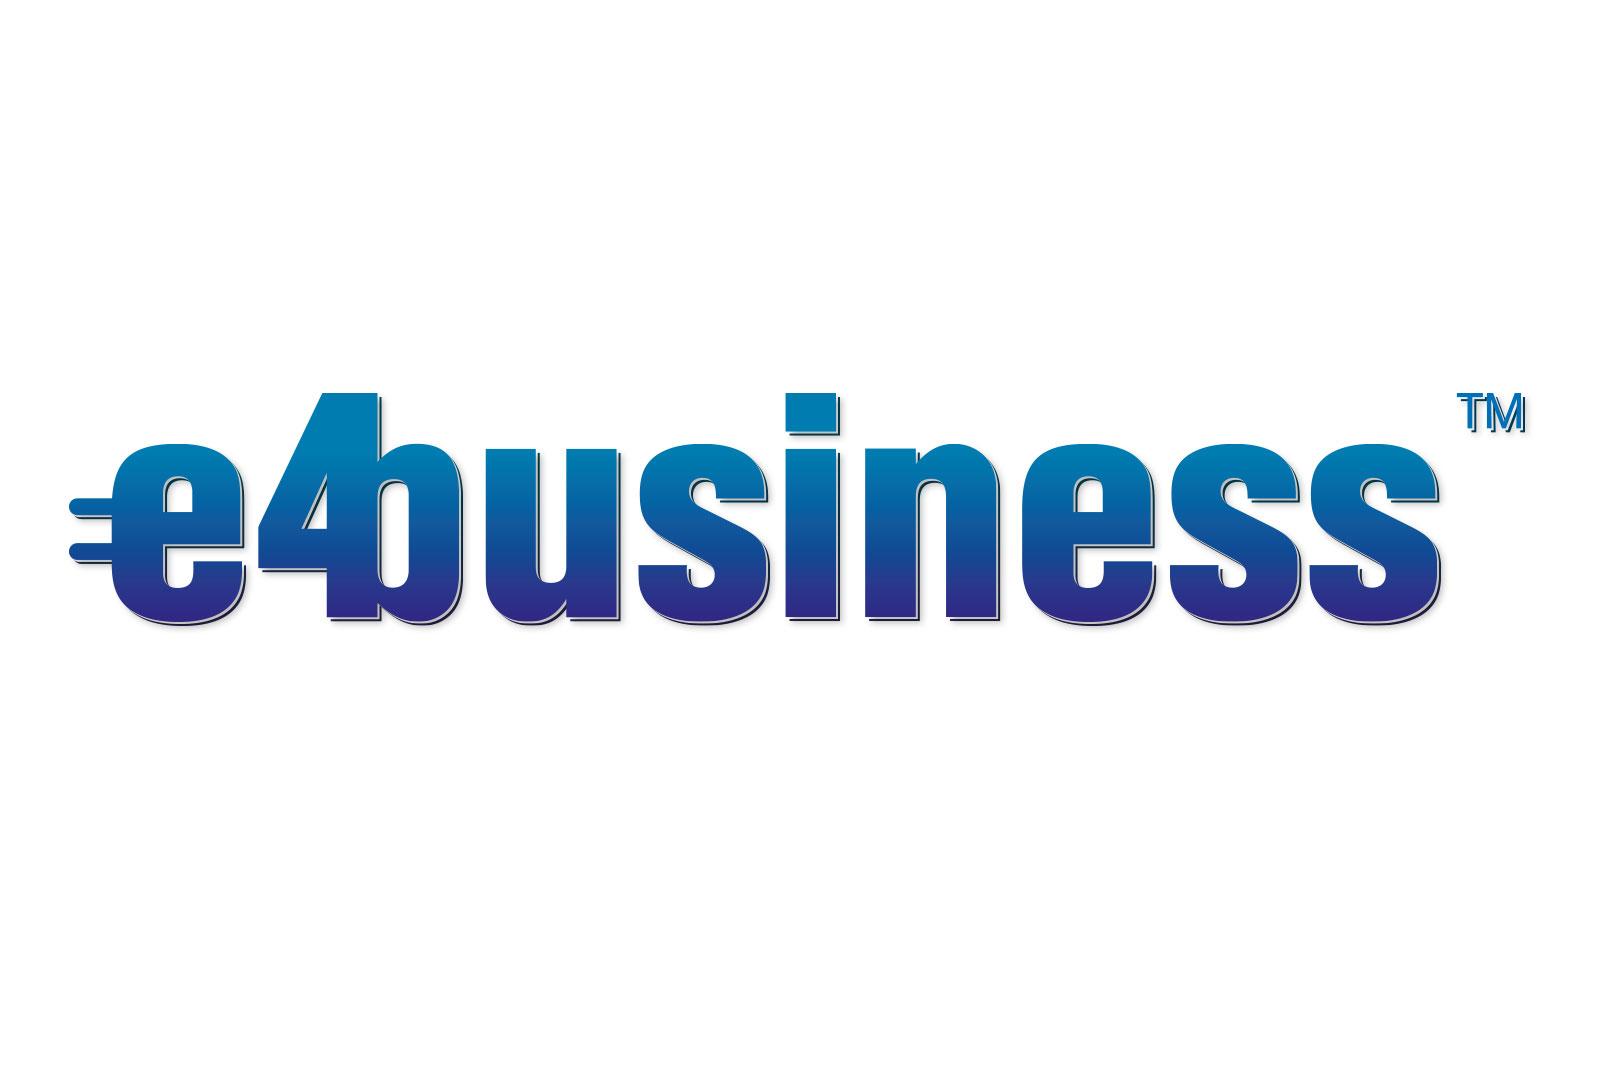 e4business-logo.jpg